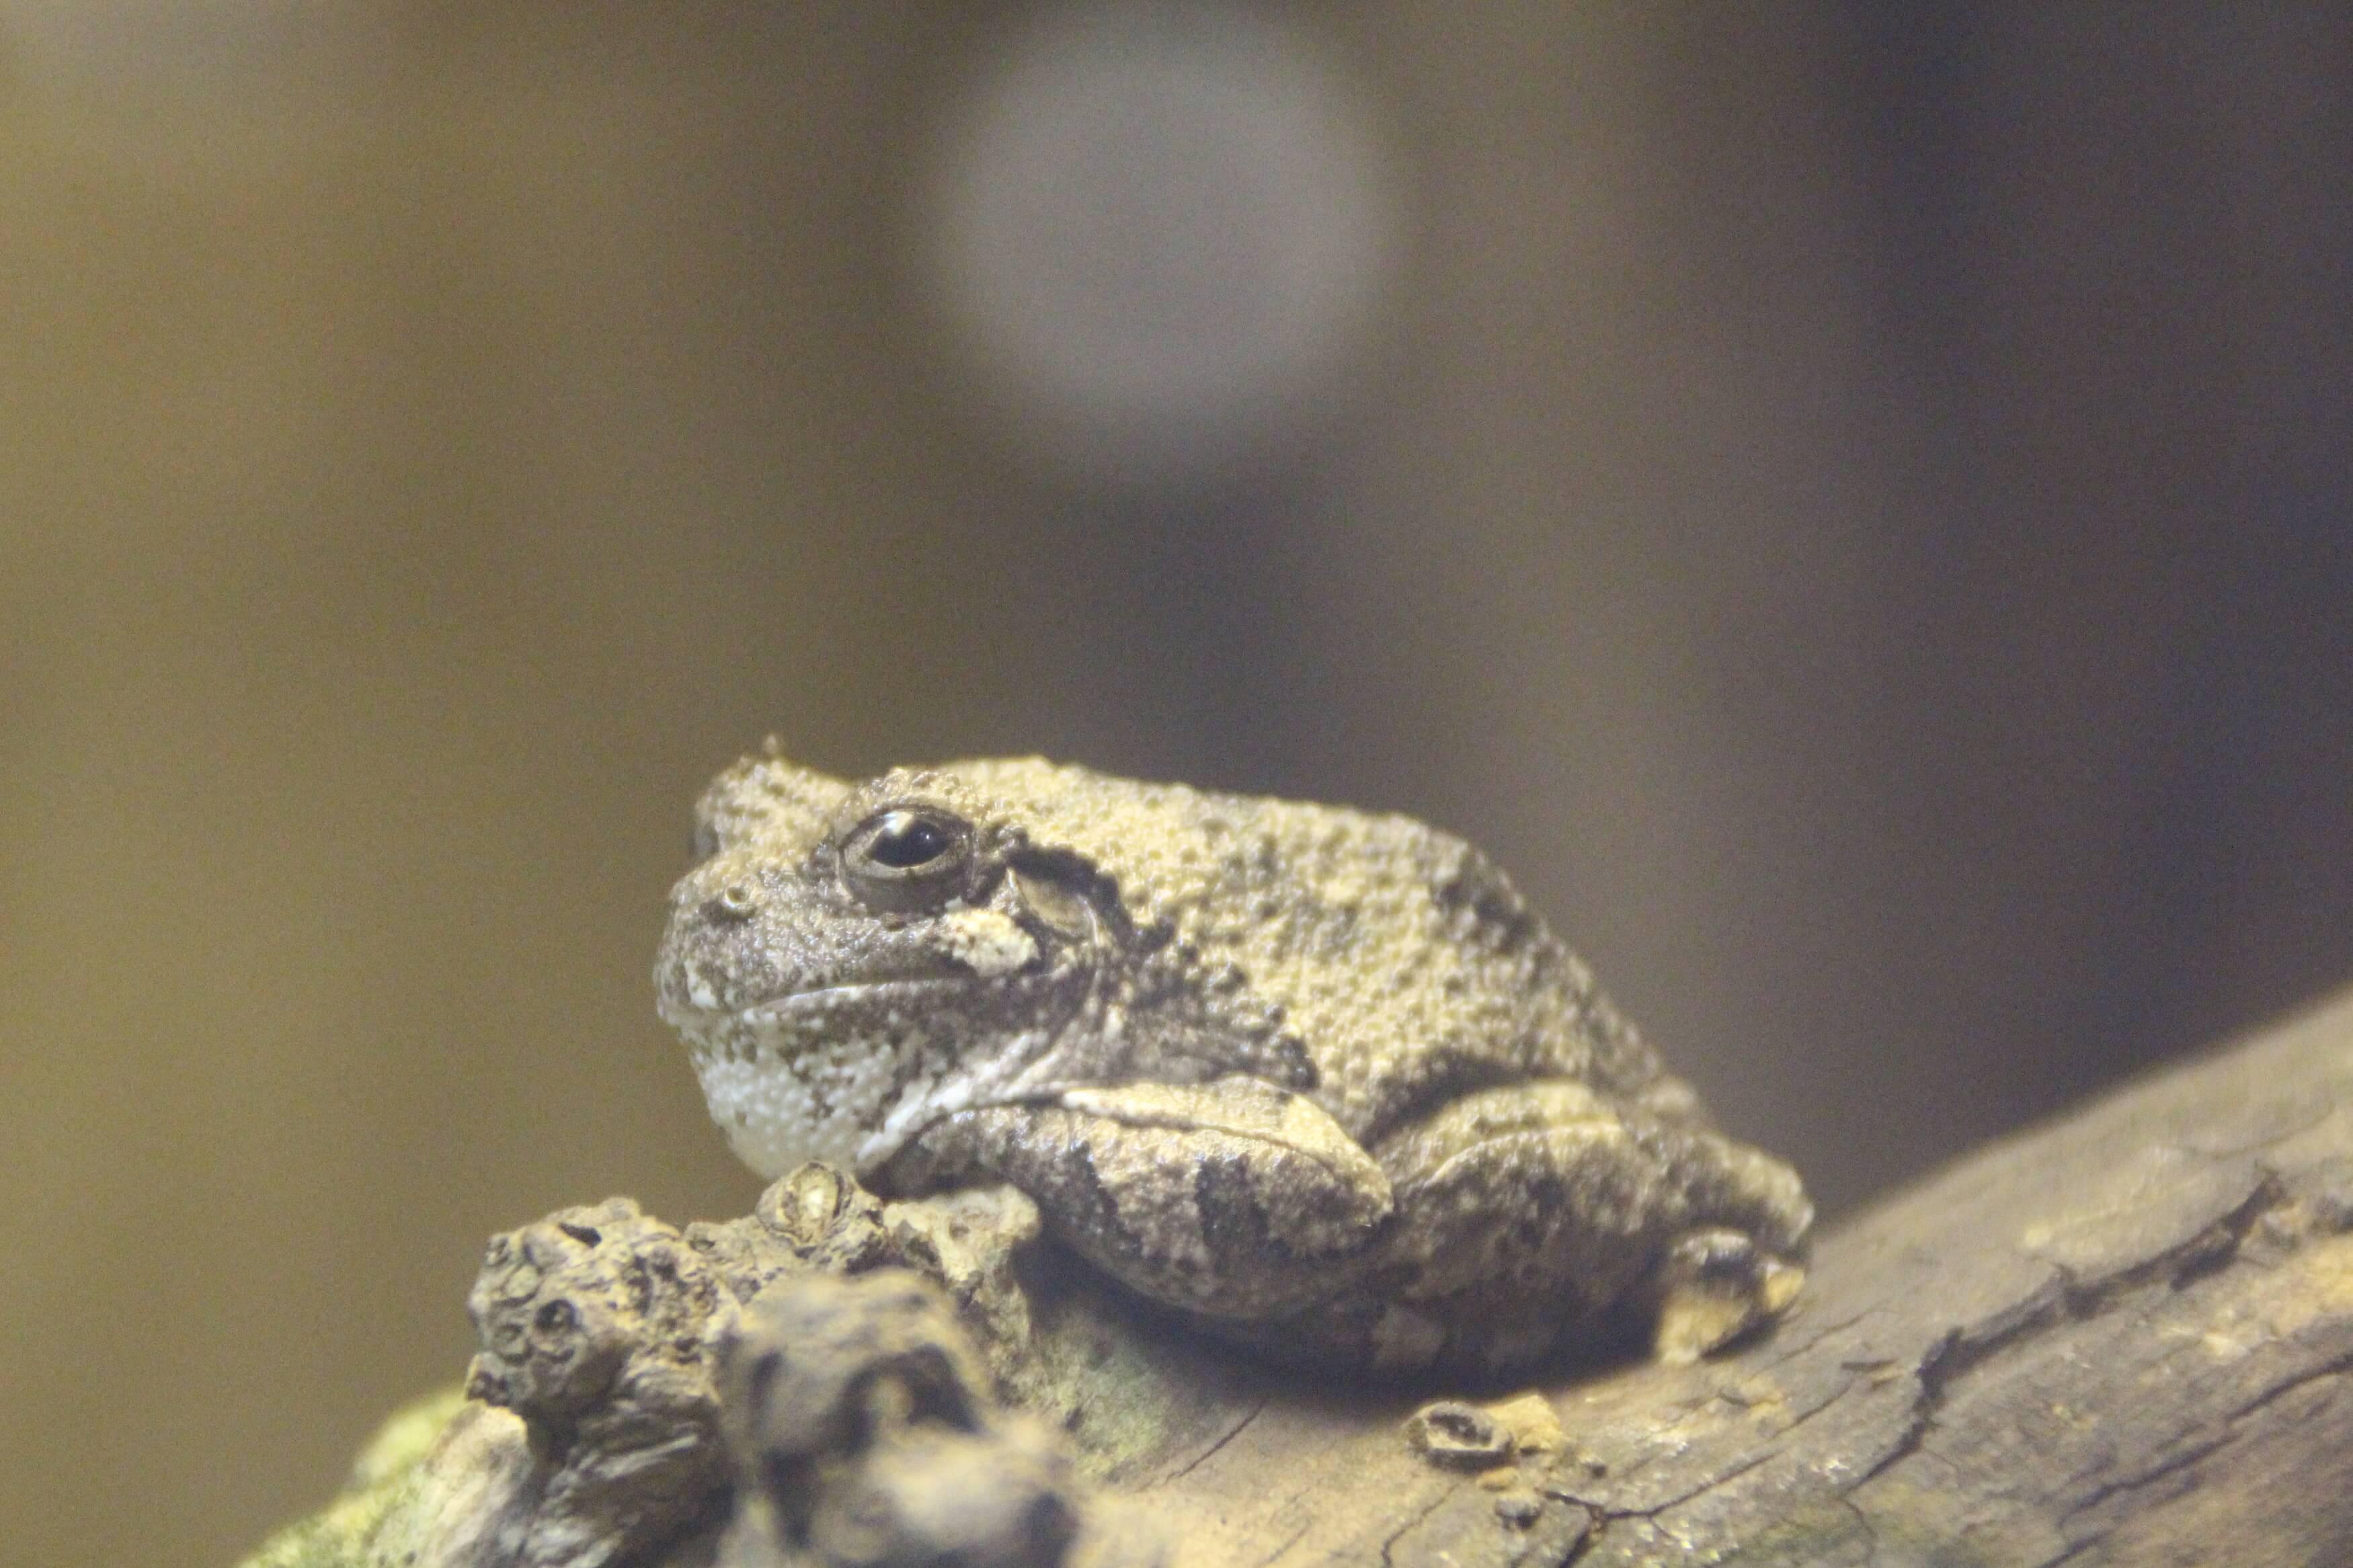 Gray Tree Frog - Binder Park Zoo